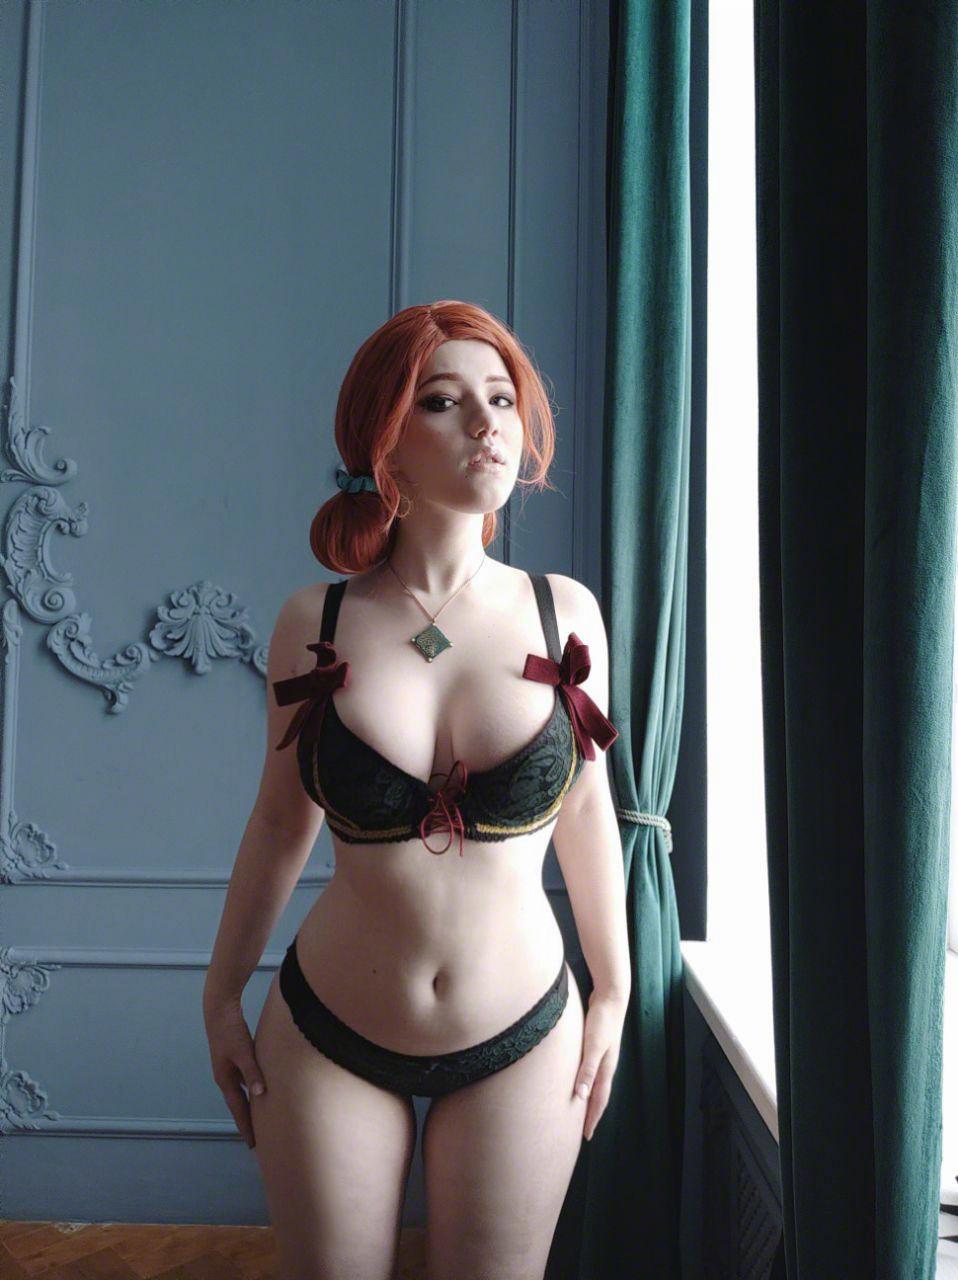 Leaked Nude Set From Lada Lyumos Patreon 0055